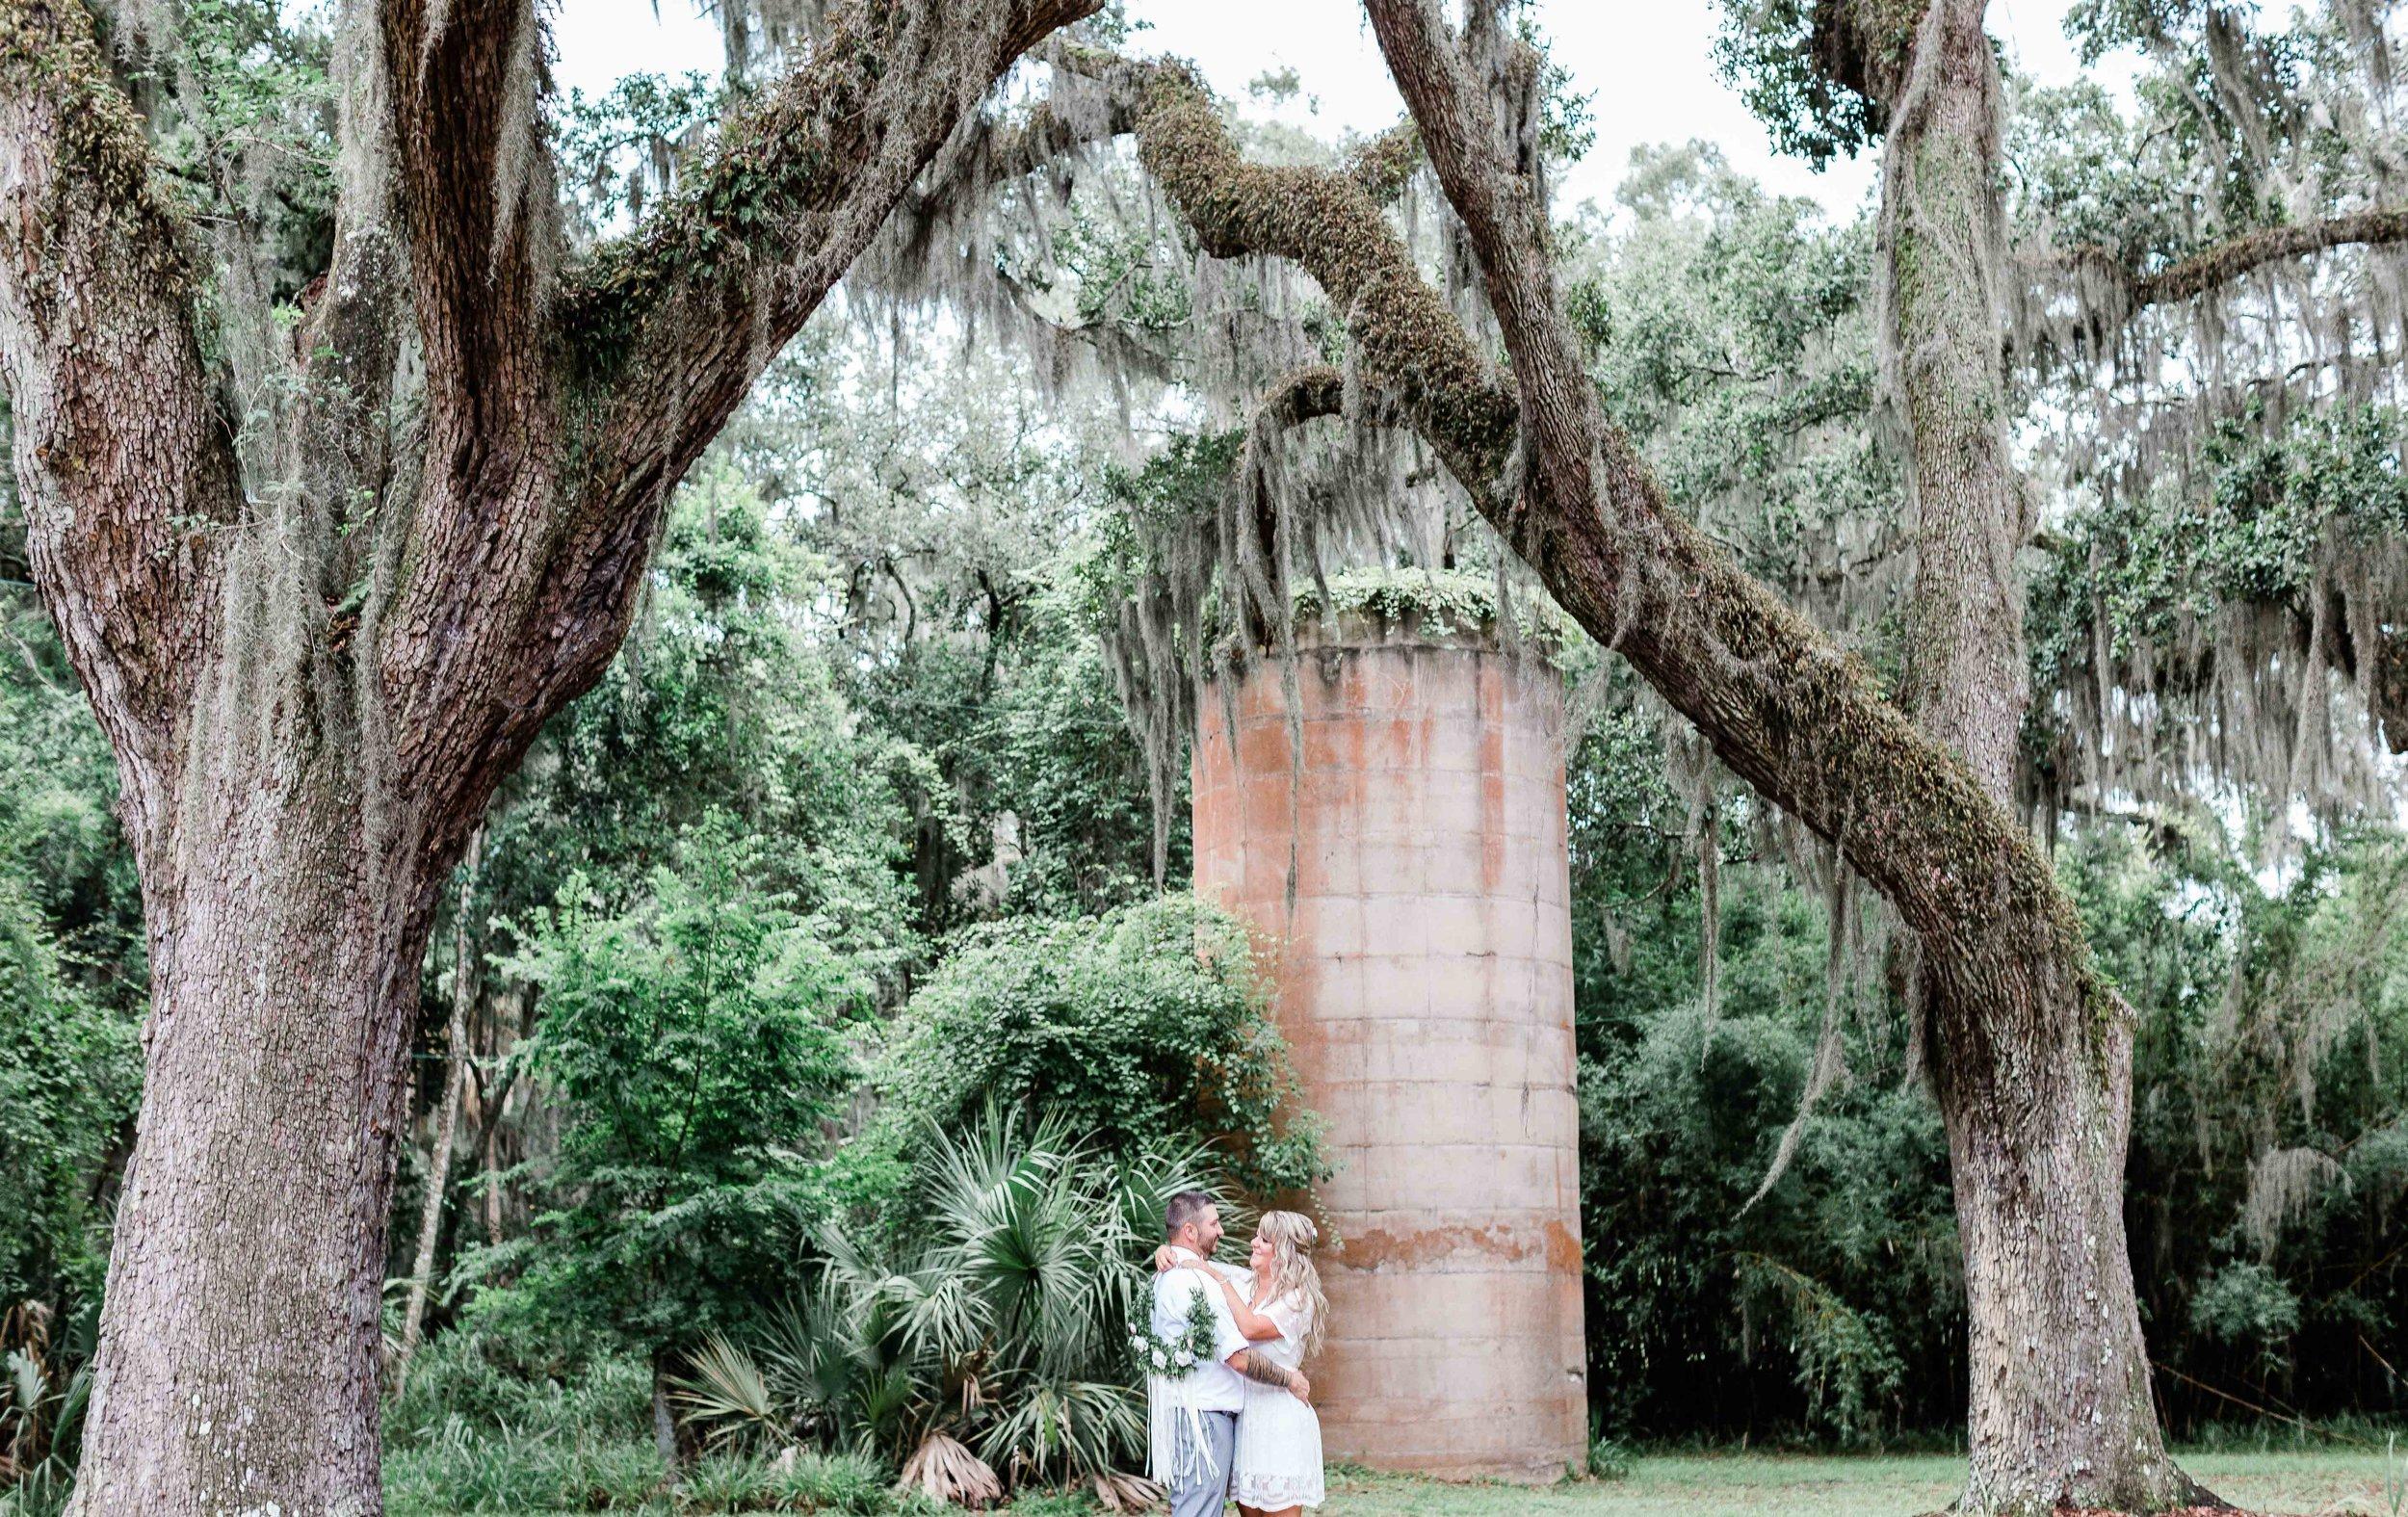 20190727Georgia-Wormlsoe Plantation-Simply Eloped-Savannah Wedding Photographer- Southern Lens Photography22.jpg